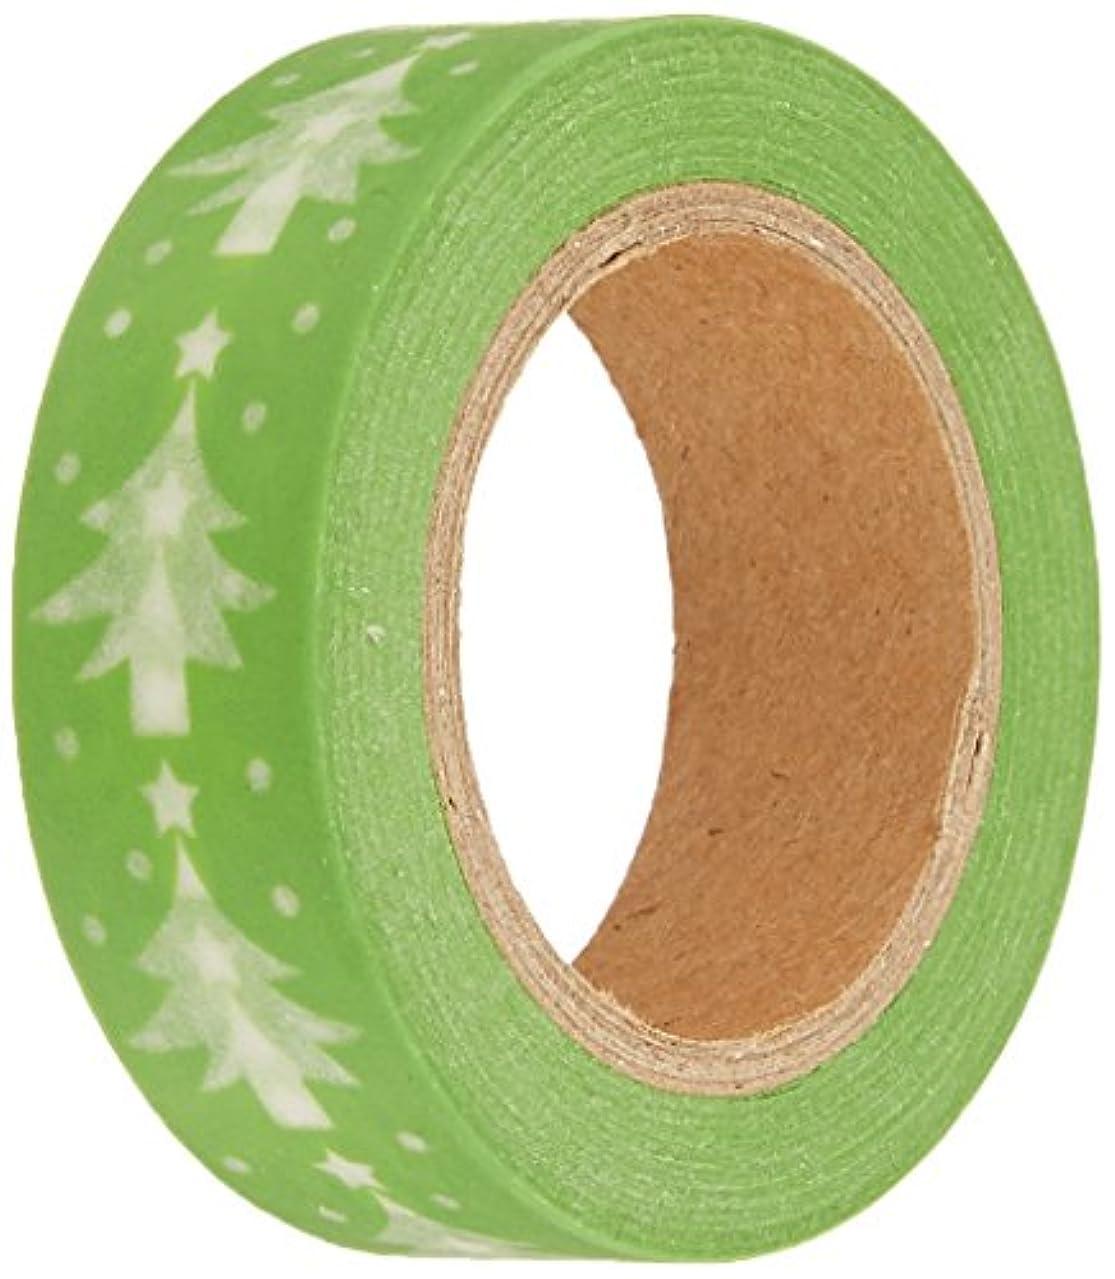 Wrapables Colorful Patterns Washi Masking Tape, Christmas Tree Light Green